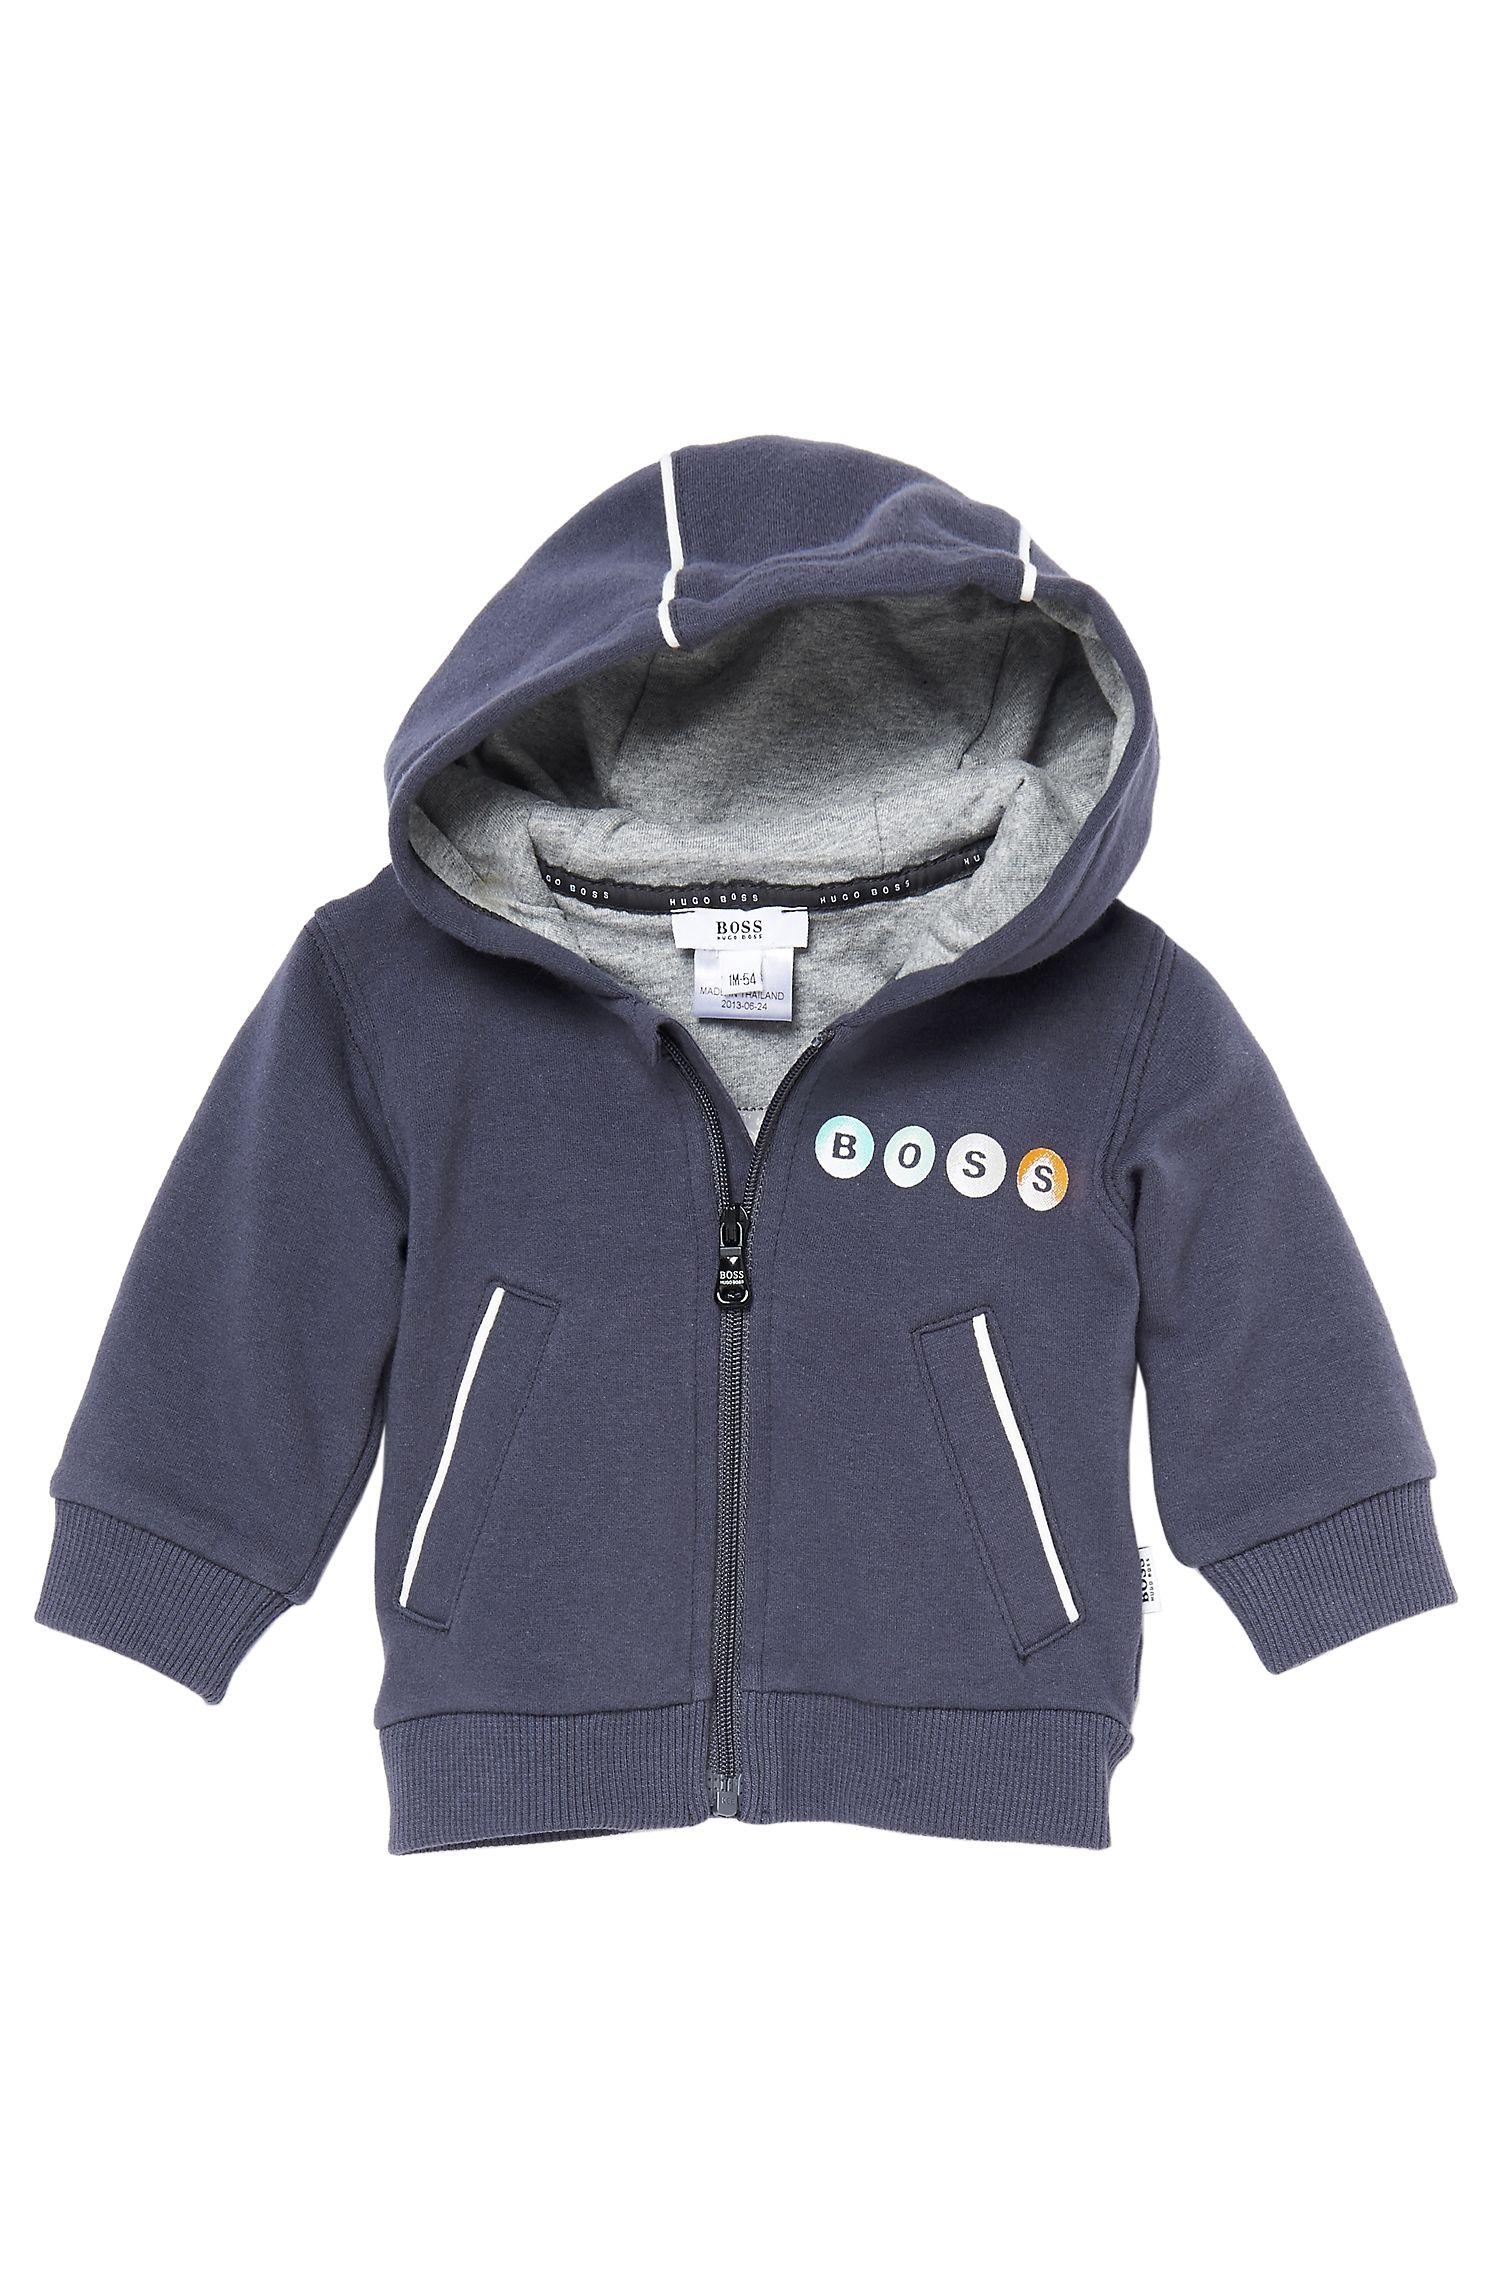 'J95109' | Infant Hooded Stretch Fleece Zip Up Hoodie